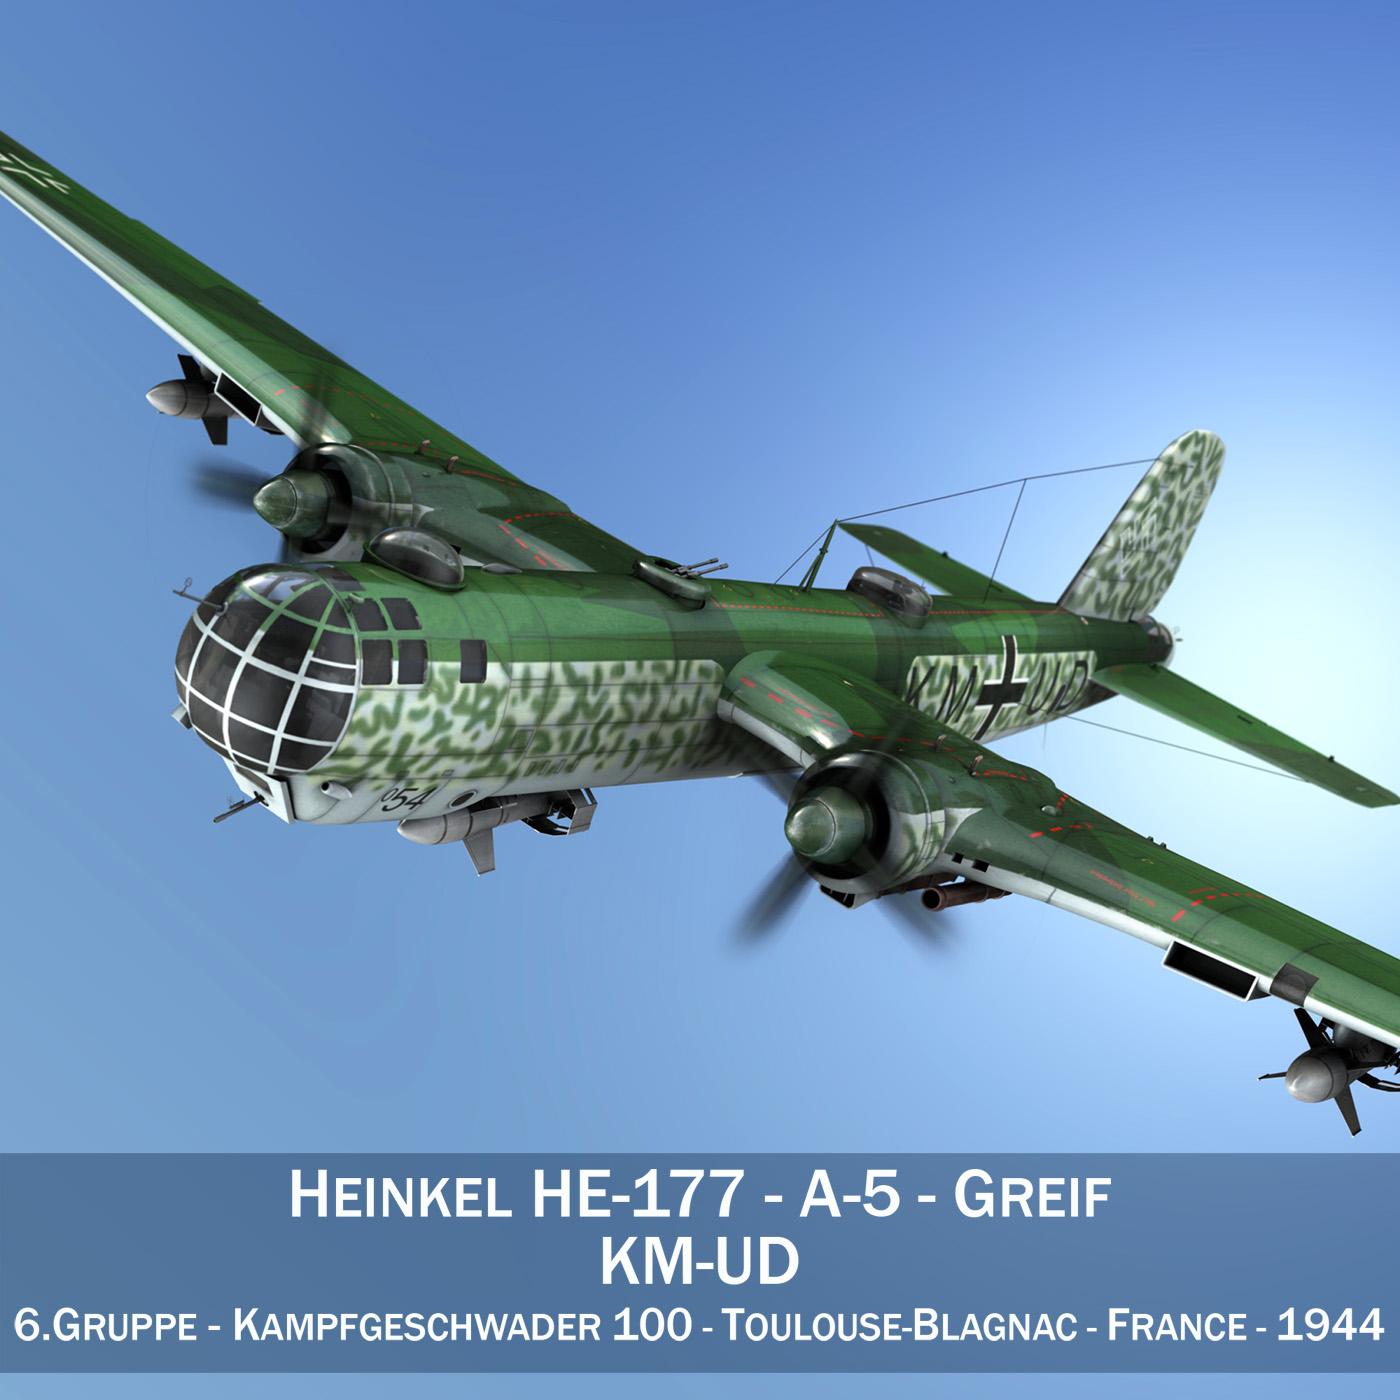 heinkel he-177 - greif - kmud Model 3d 3ds fbx c4d lwo obj 201562